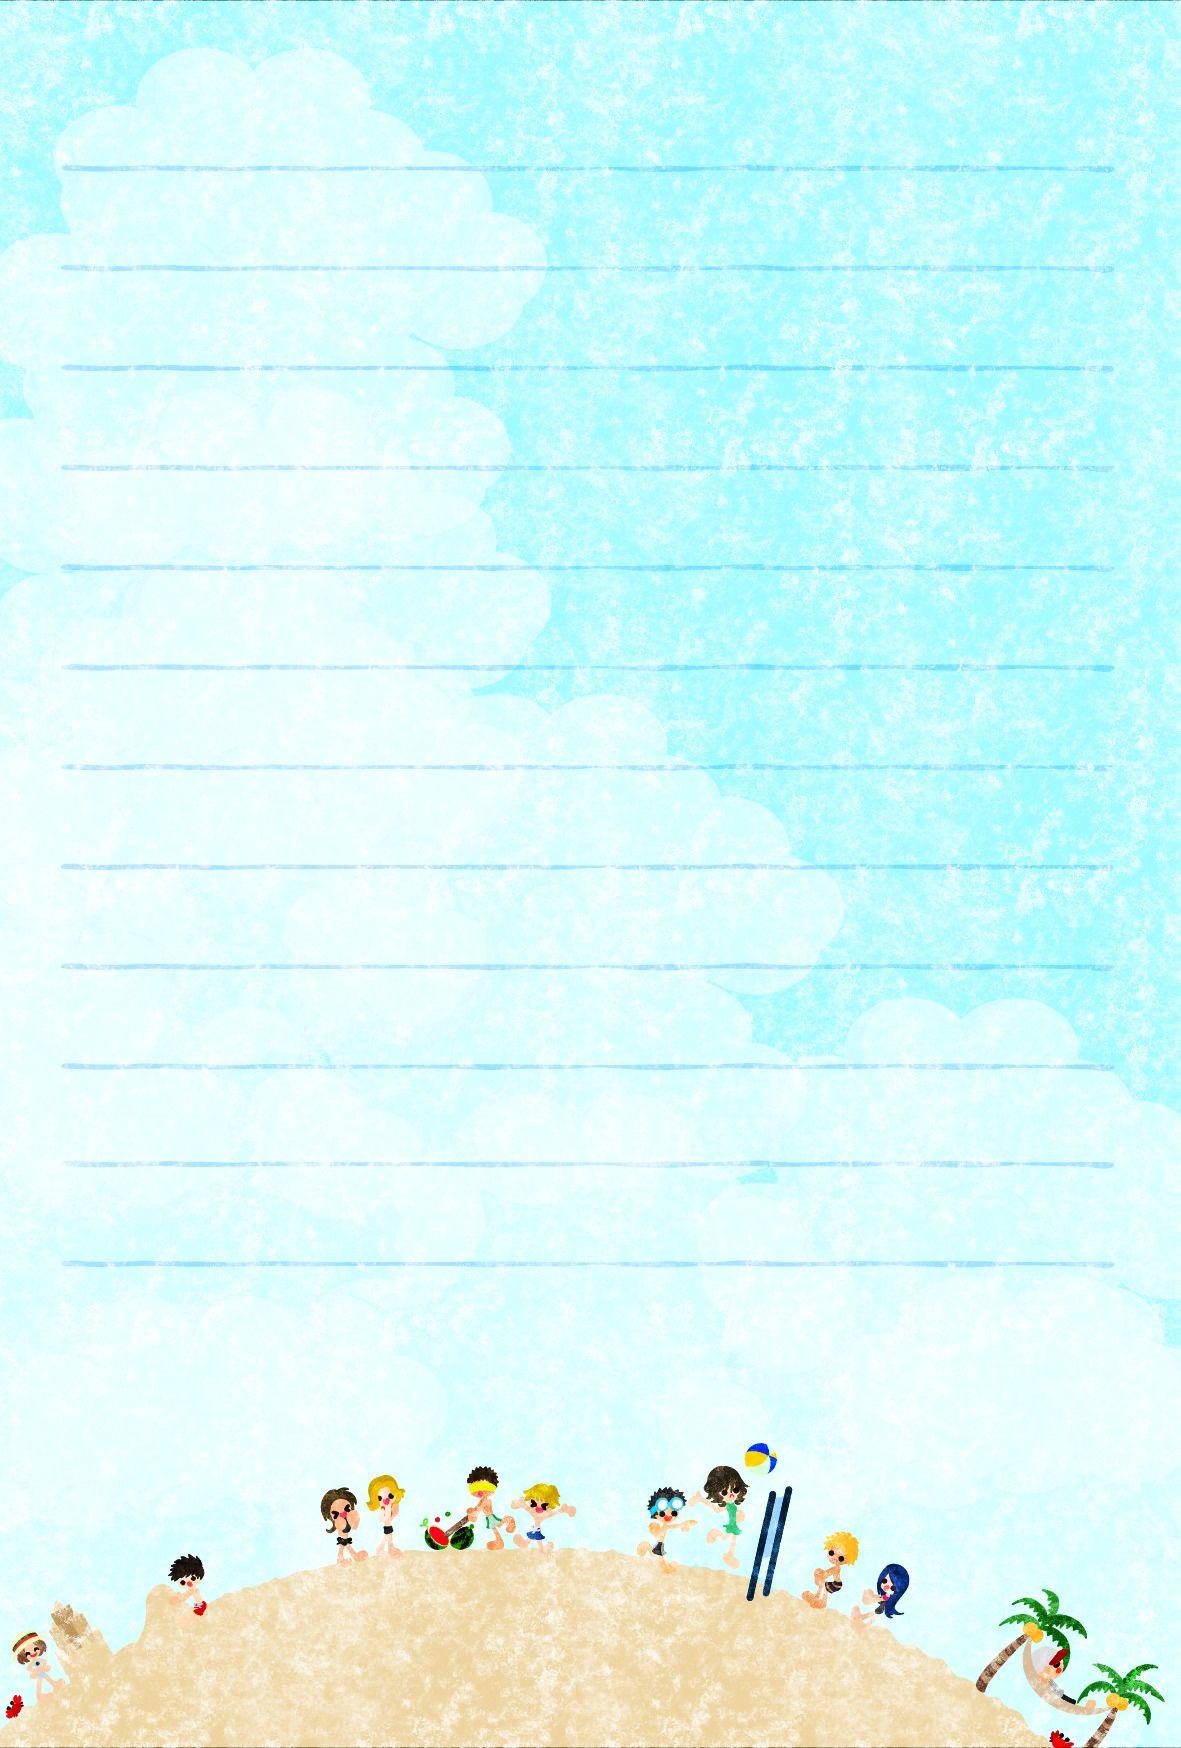 Atelier B W そのまま印刷できて 暑中見舞いにも使えるフリーのイラスト素材 夏のポストカード Free ポスト